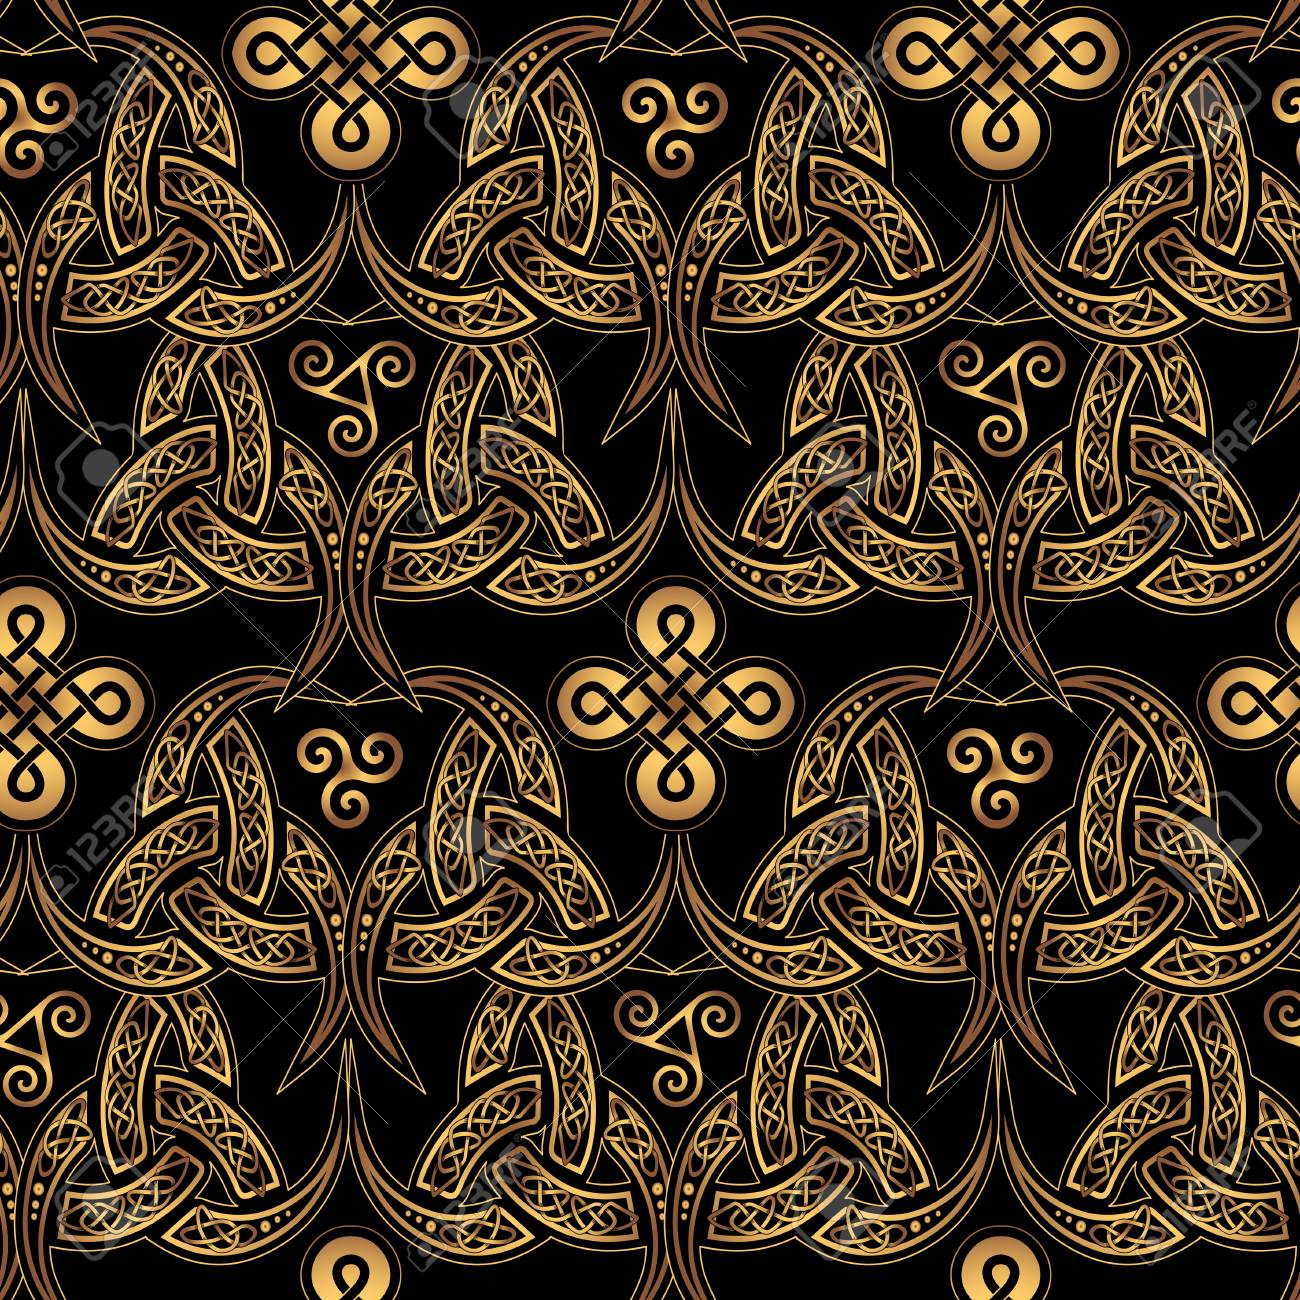 83079088 scandinavian celtic seamless wallpaper elegant golden ethnic patterns of druids on a black backgroun